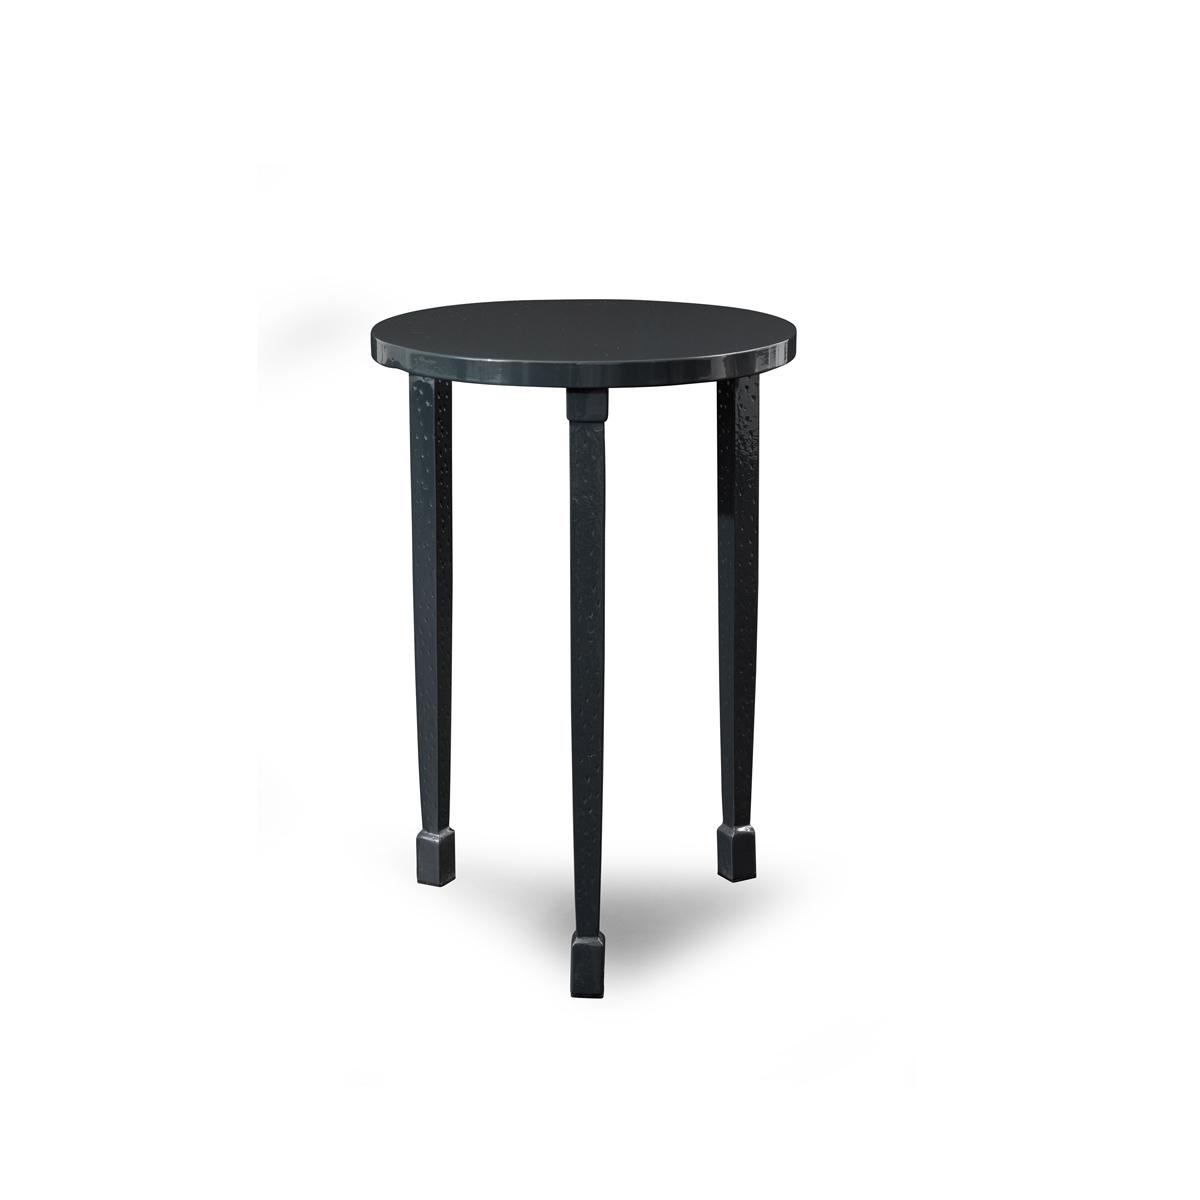 Metal Table with Three Legs_MH_Web.jpg